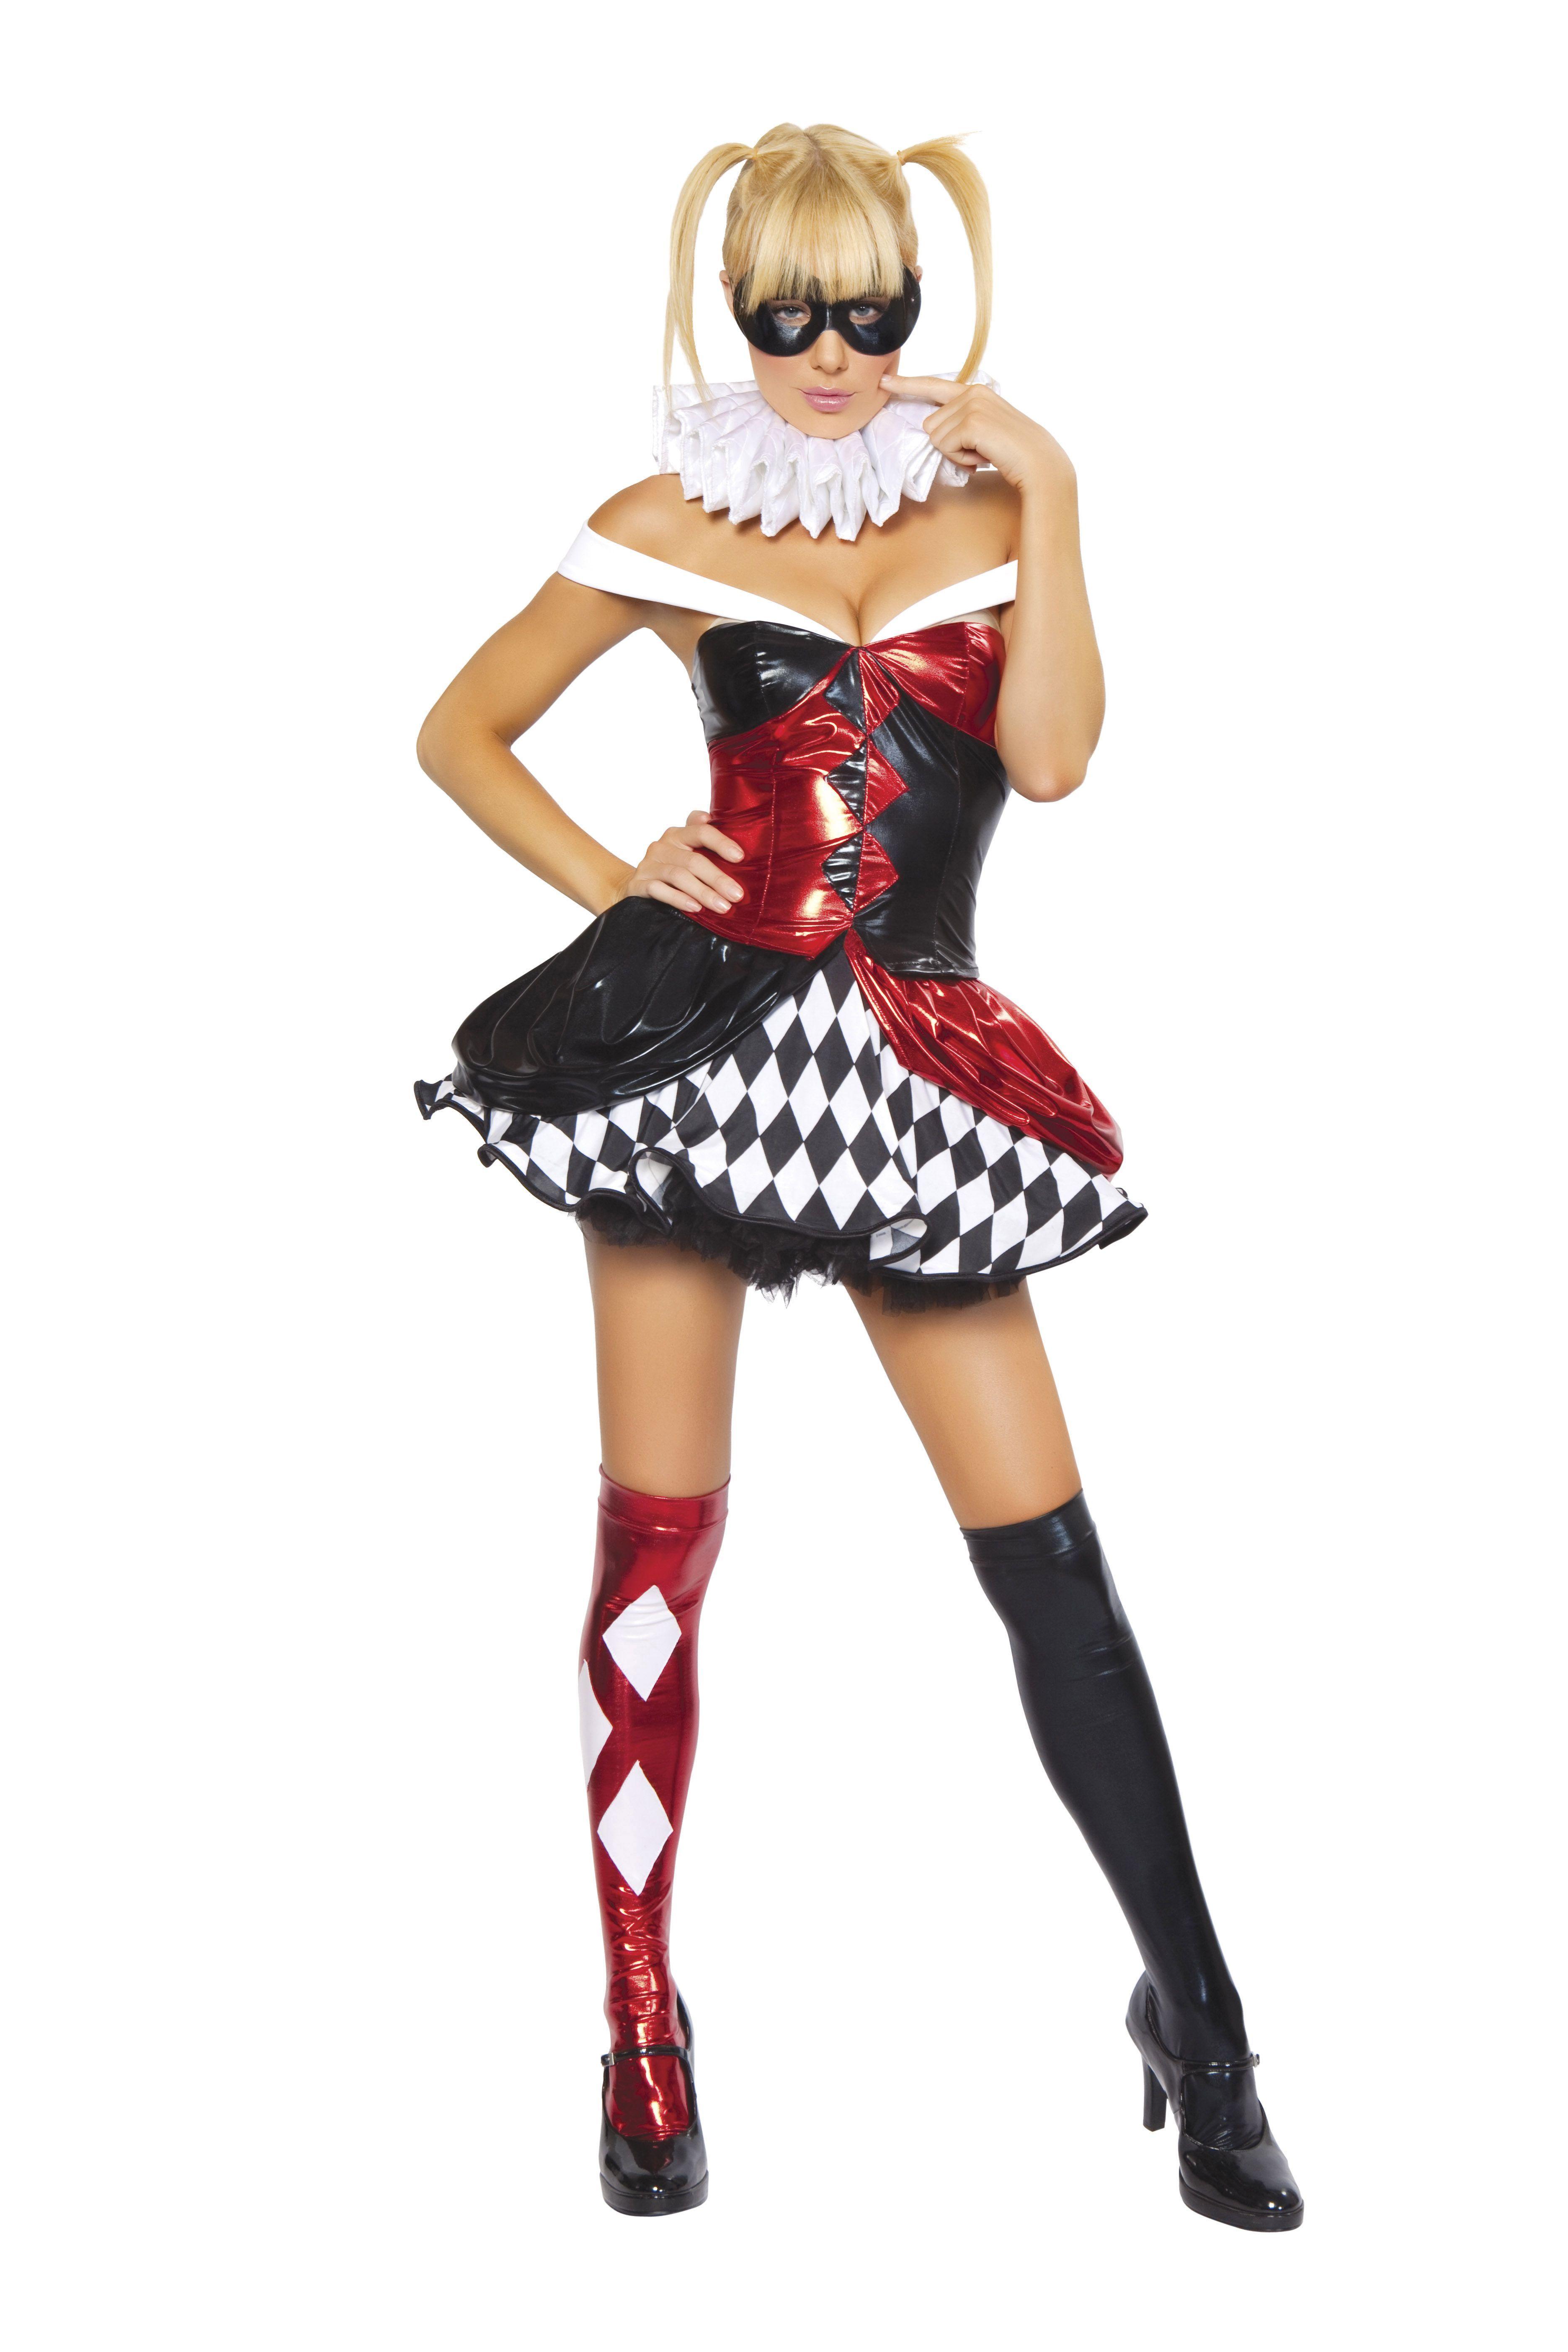 Sexy Clown Women Halloween Costume | $89.99 | The Costume Land  sc 1 st  Pinterest & Sexy Clown Women Halloween Costume | $89.99 | The Costume Land ...